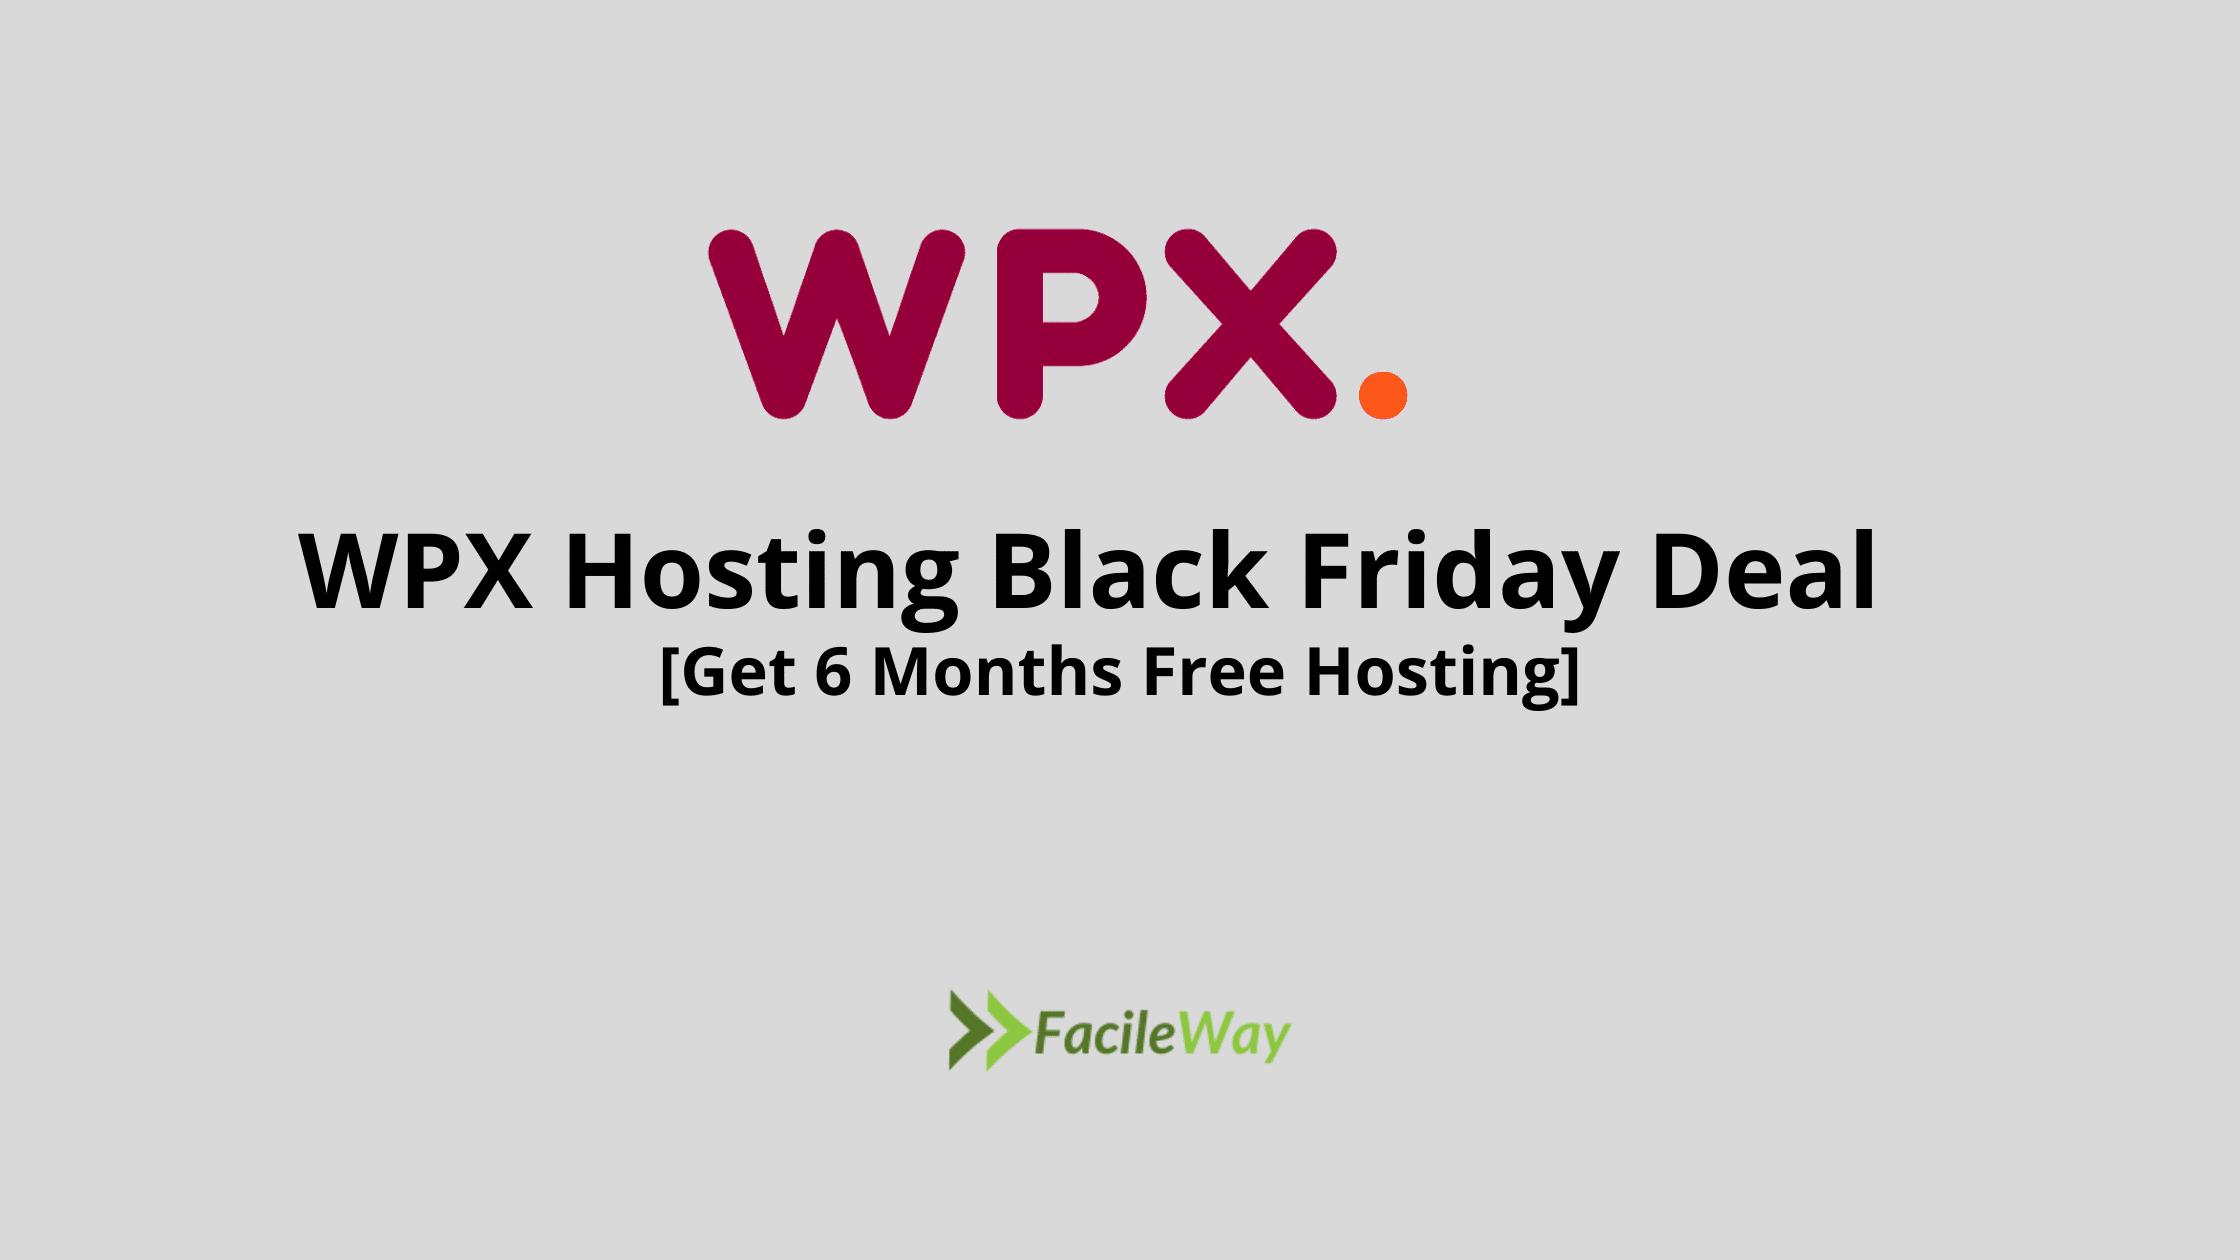 WPX Hosting Black Friday Deal